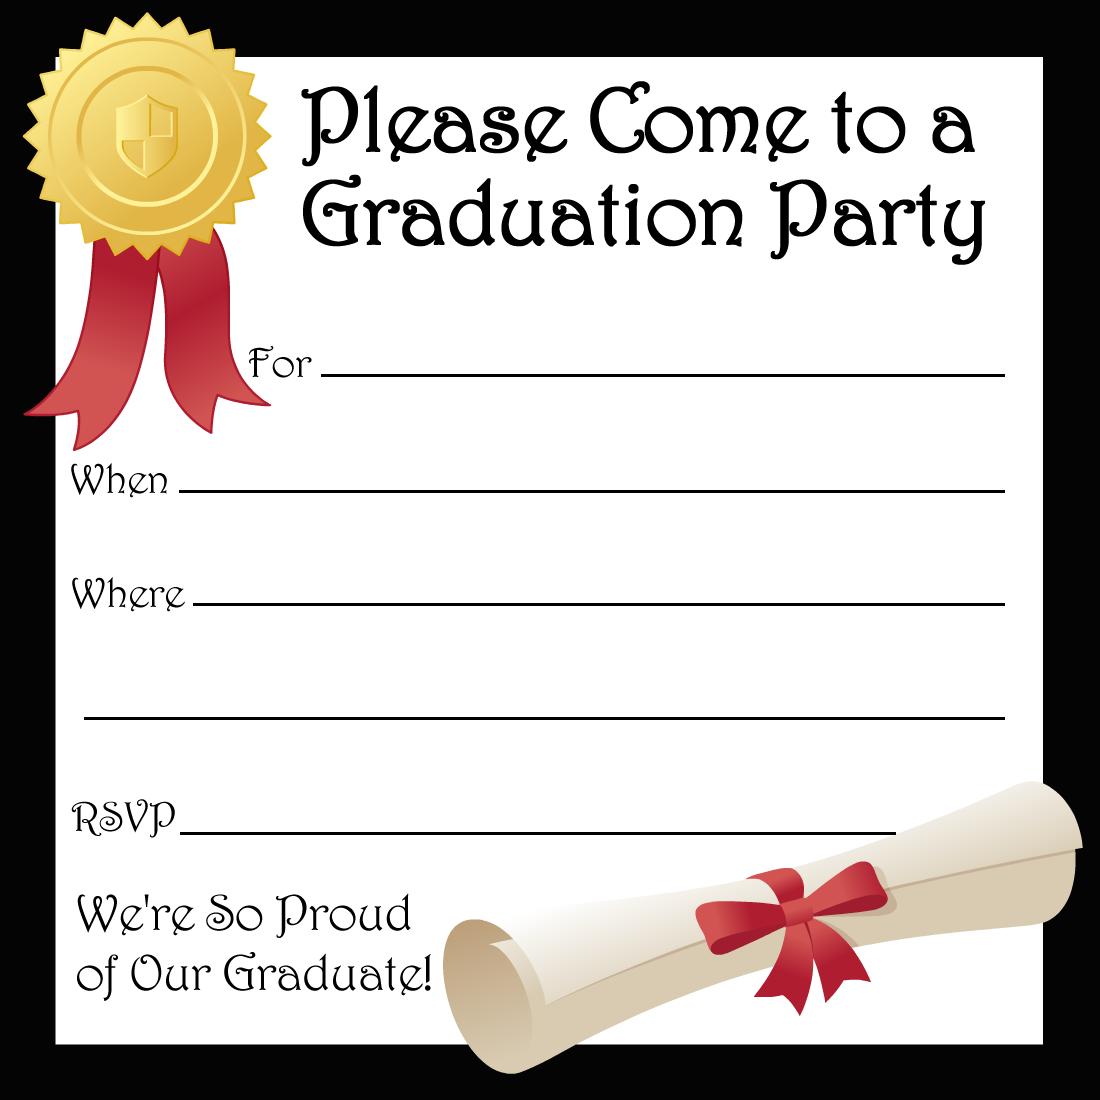 Invitations For Graduation Party Templates Elegant Invitations For